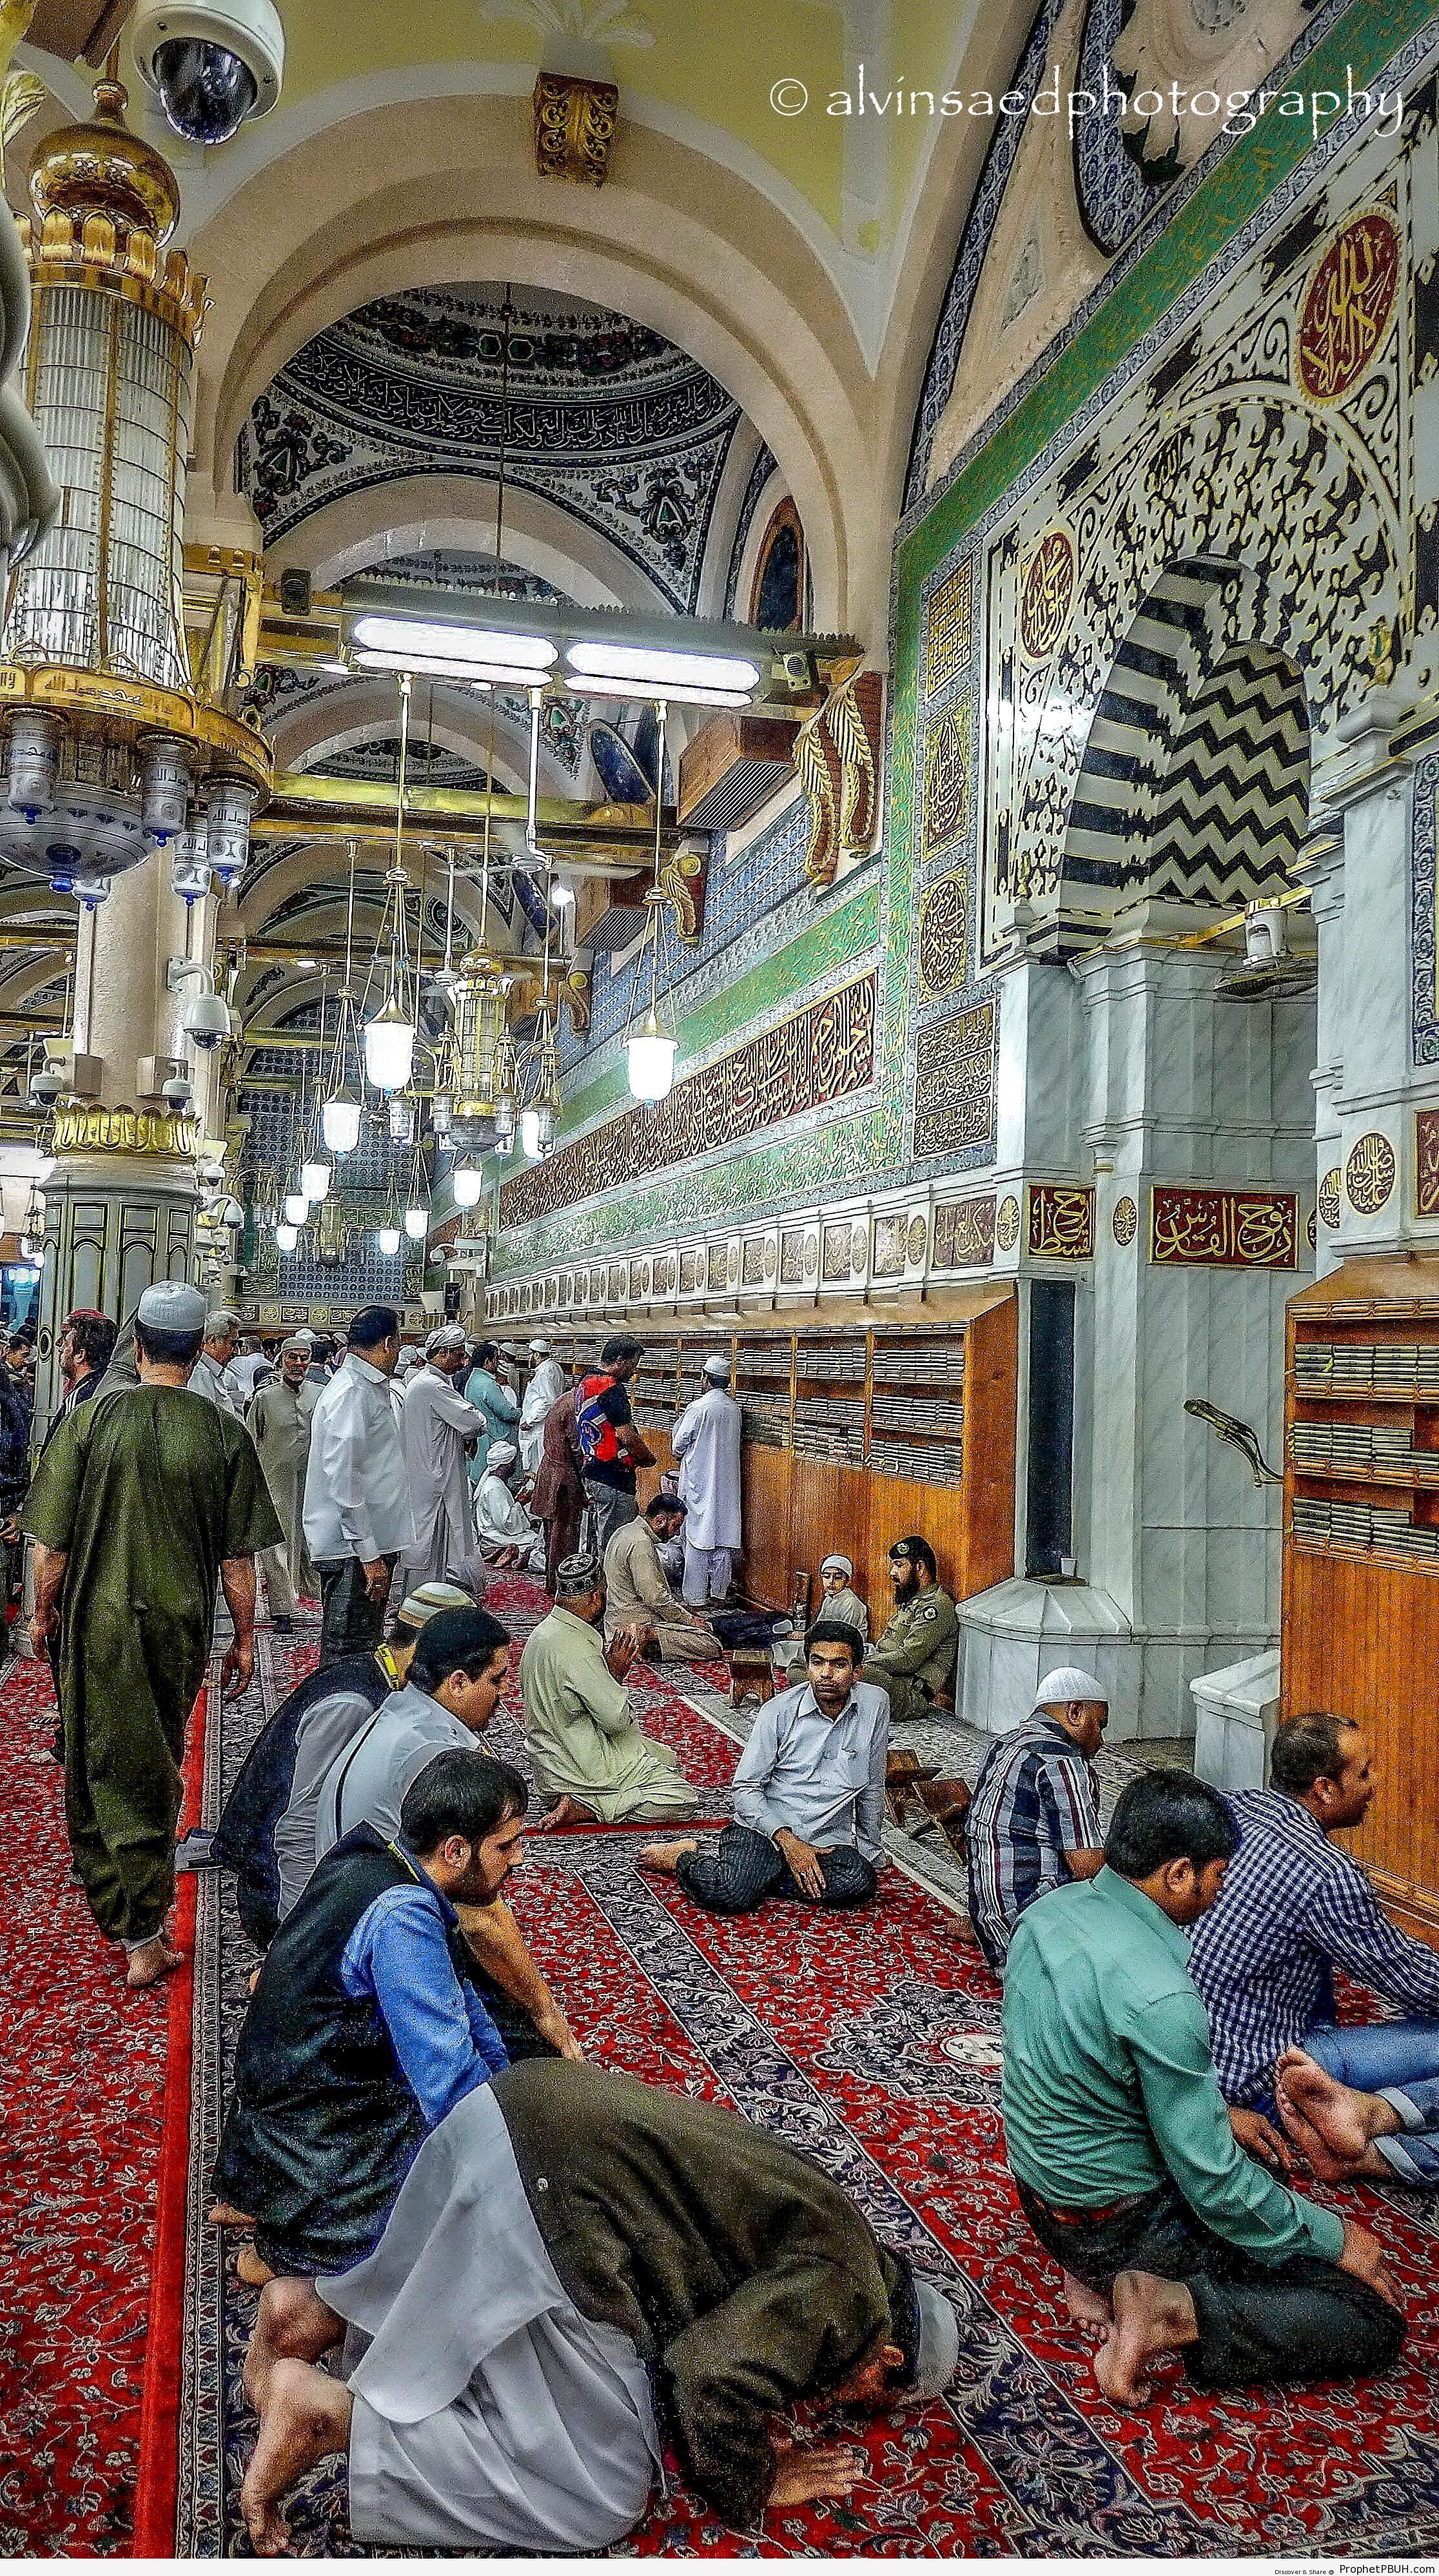 Inside al-Masjid an-Nabawi Prayer Hall (al-Madinah, Saudi Arabia) - Al-Masjid an-Nabawi (The Prophets Mosque) in Madinah, Saudi Arabia -Picture